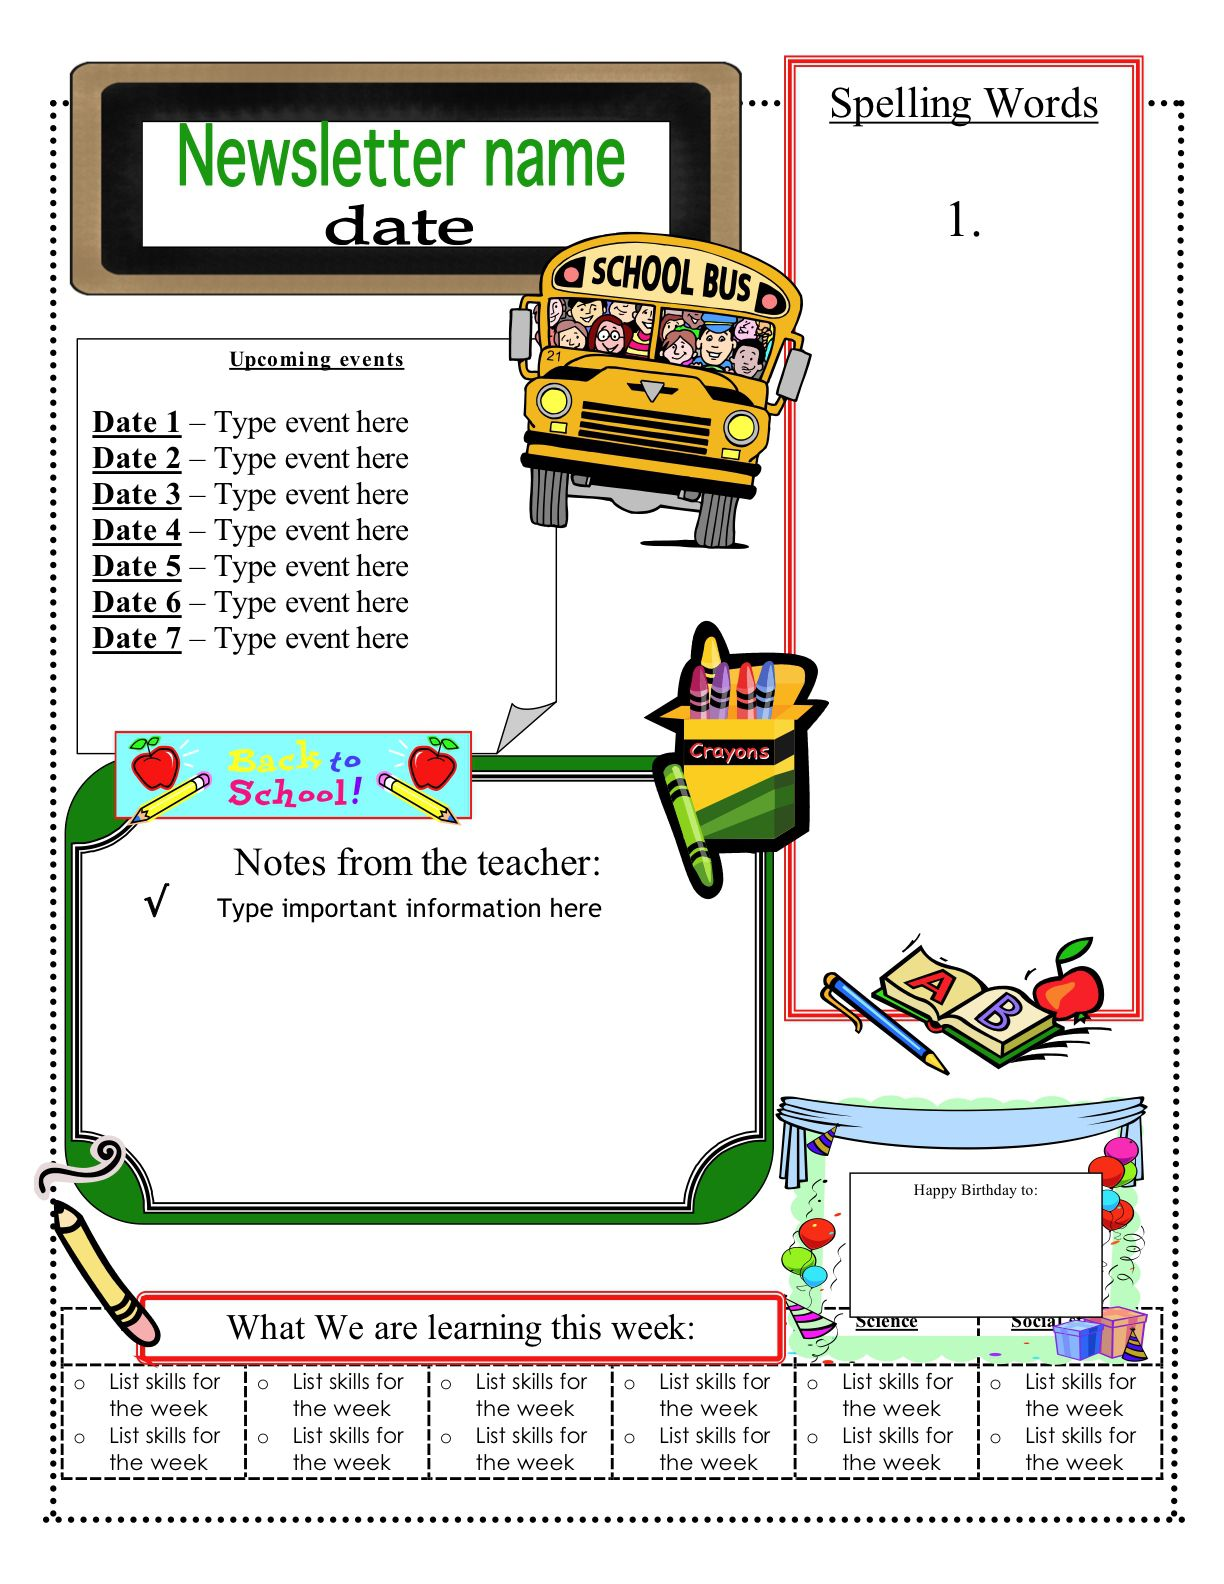 005 Singular Free Editable Daycare Newsletter Template For Word Inspiration  ClassroomFull